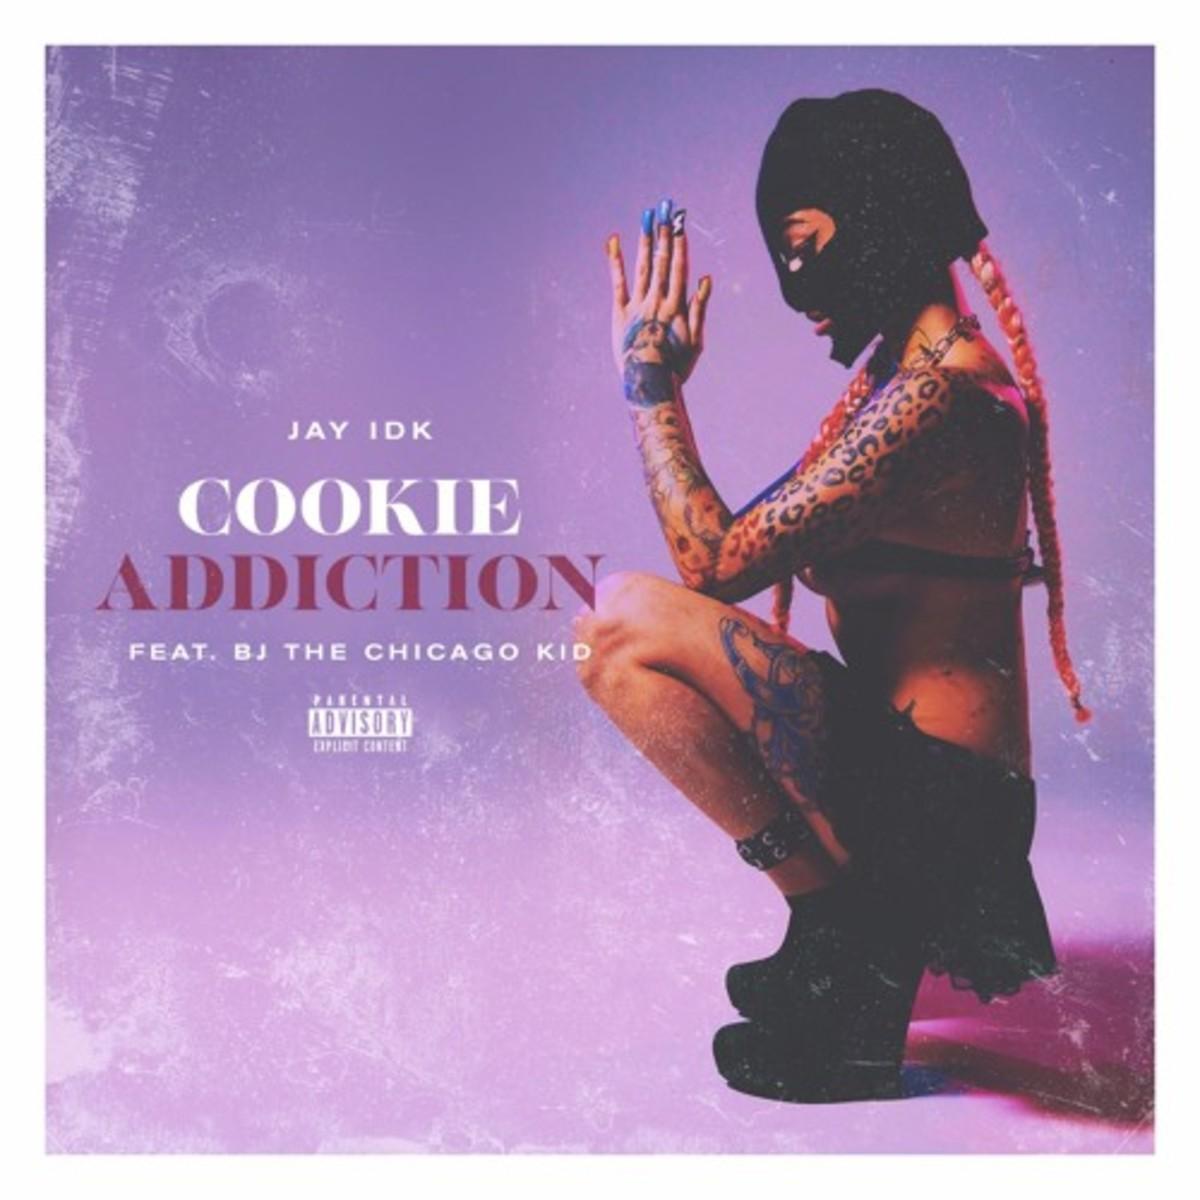 jay-idk-cookie-addiction.jpg